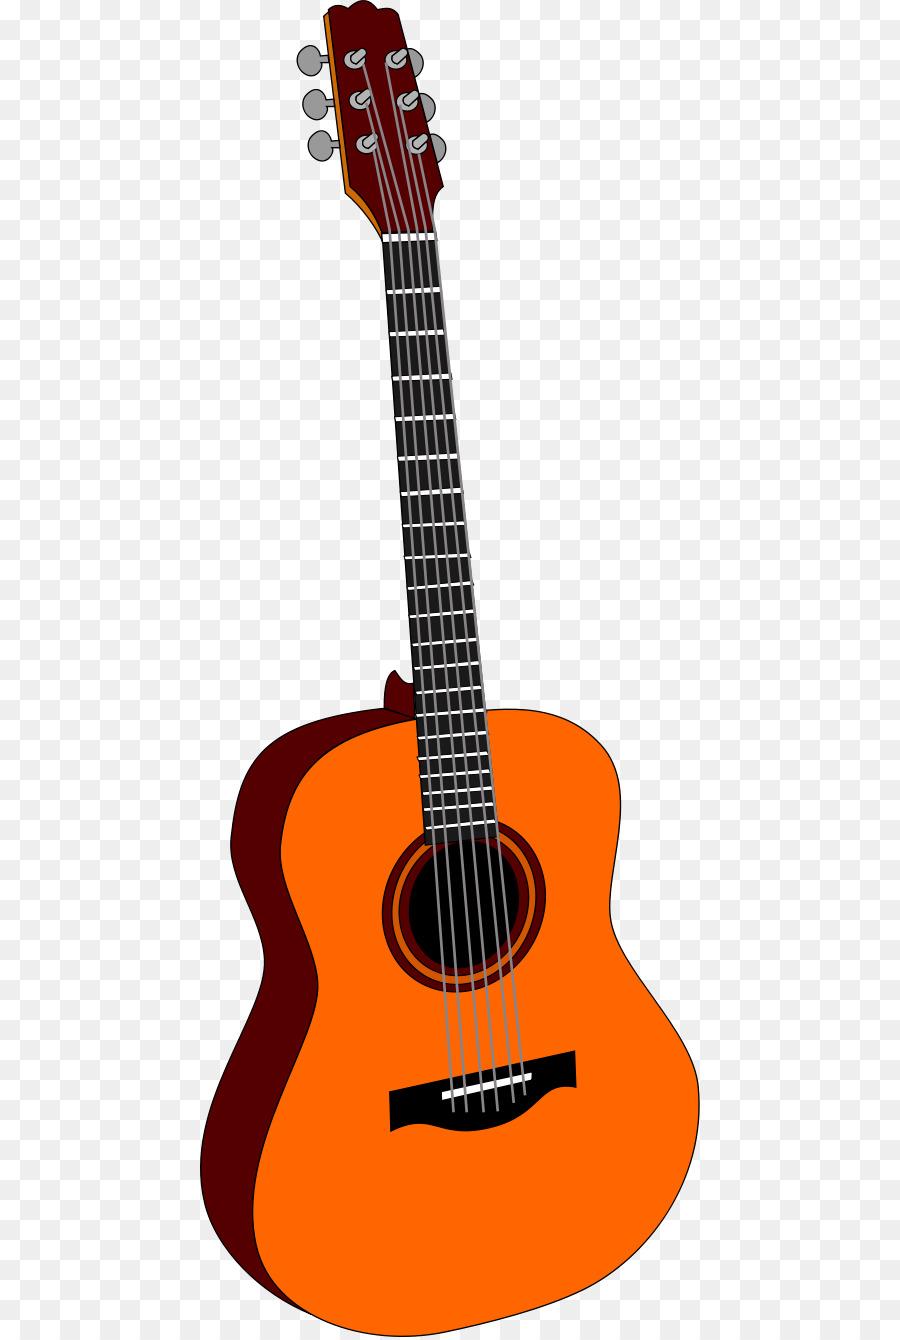 Free Guitar Clipart Transparent Background, Download Free Clip Art.